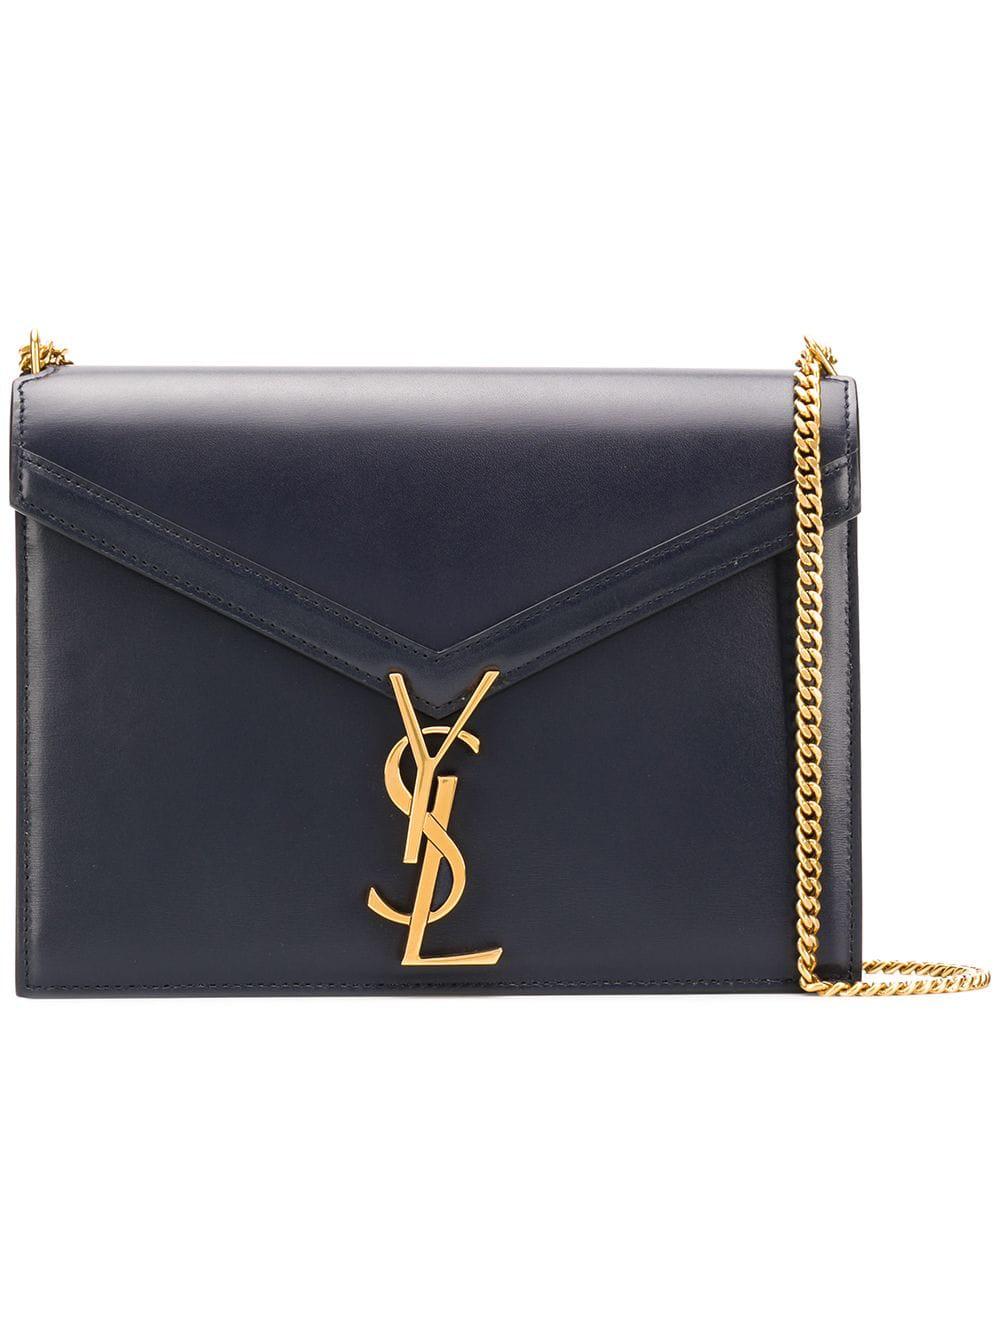 185fd822ee ... leather Cassandra Monogram bag from Saint Laurent features a gold-tone  chain shoulder strap